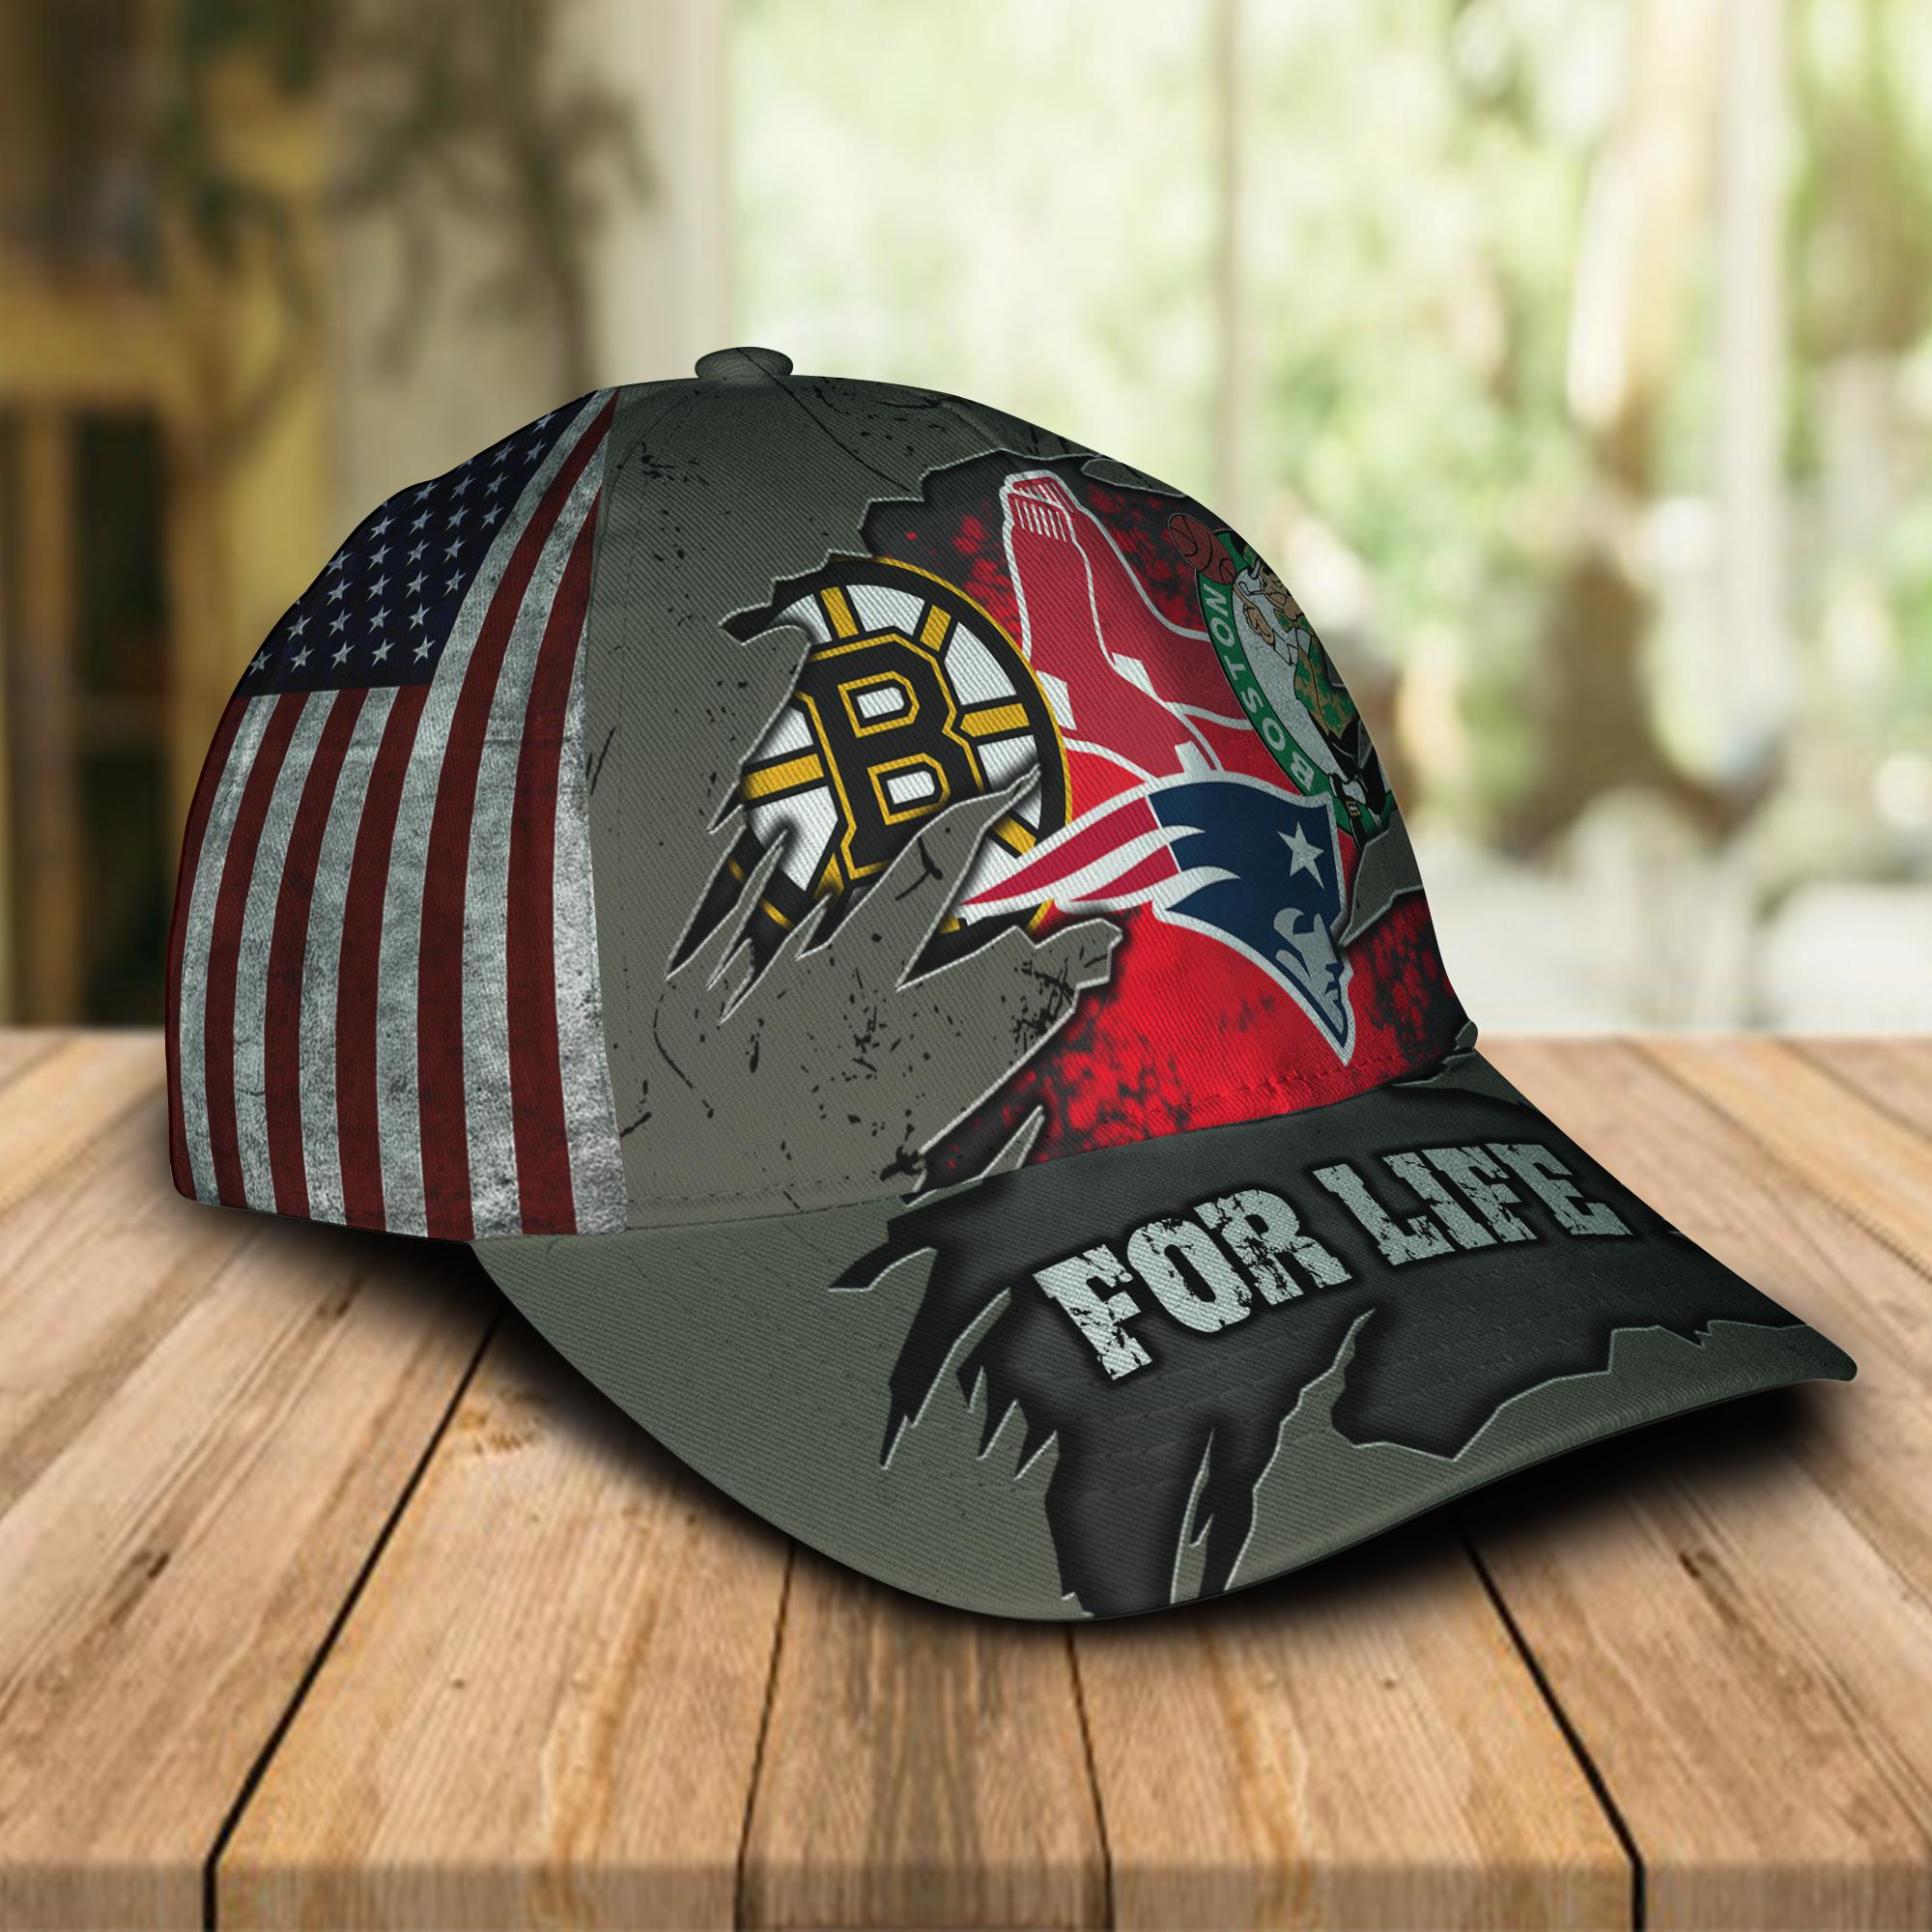 Boston-Celtics-New-England-Patriots-Boston-Bruins-Boston-Red-Sox-For-Life-Cap-Hat1